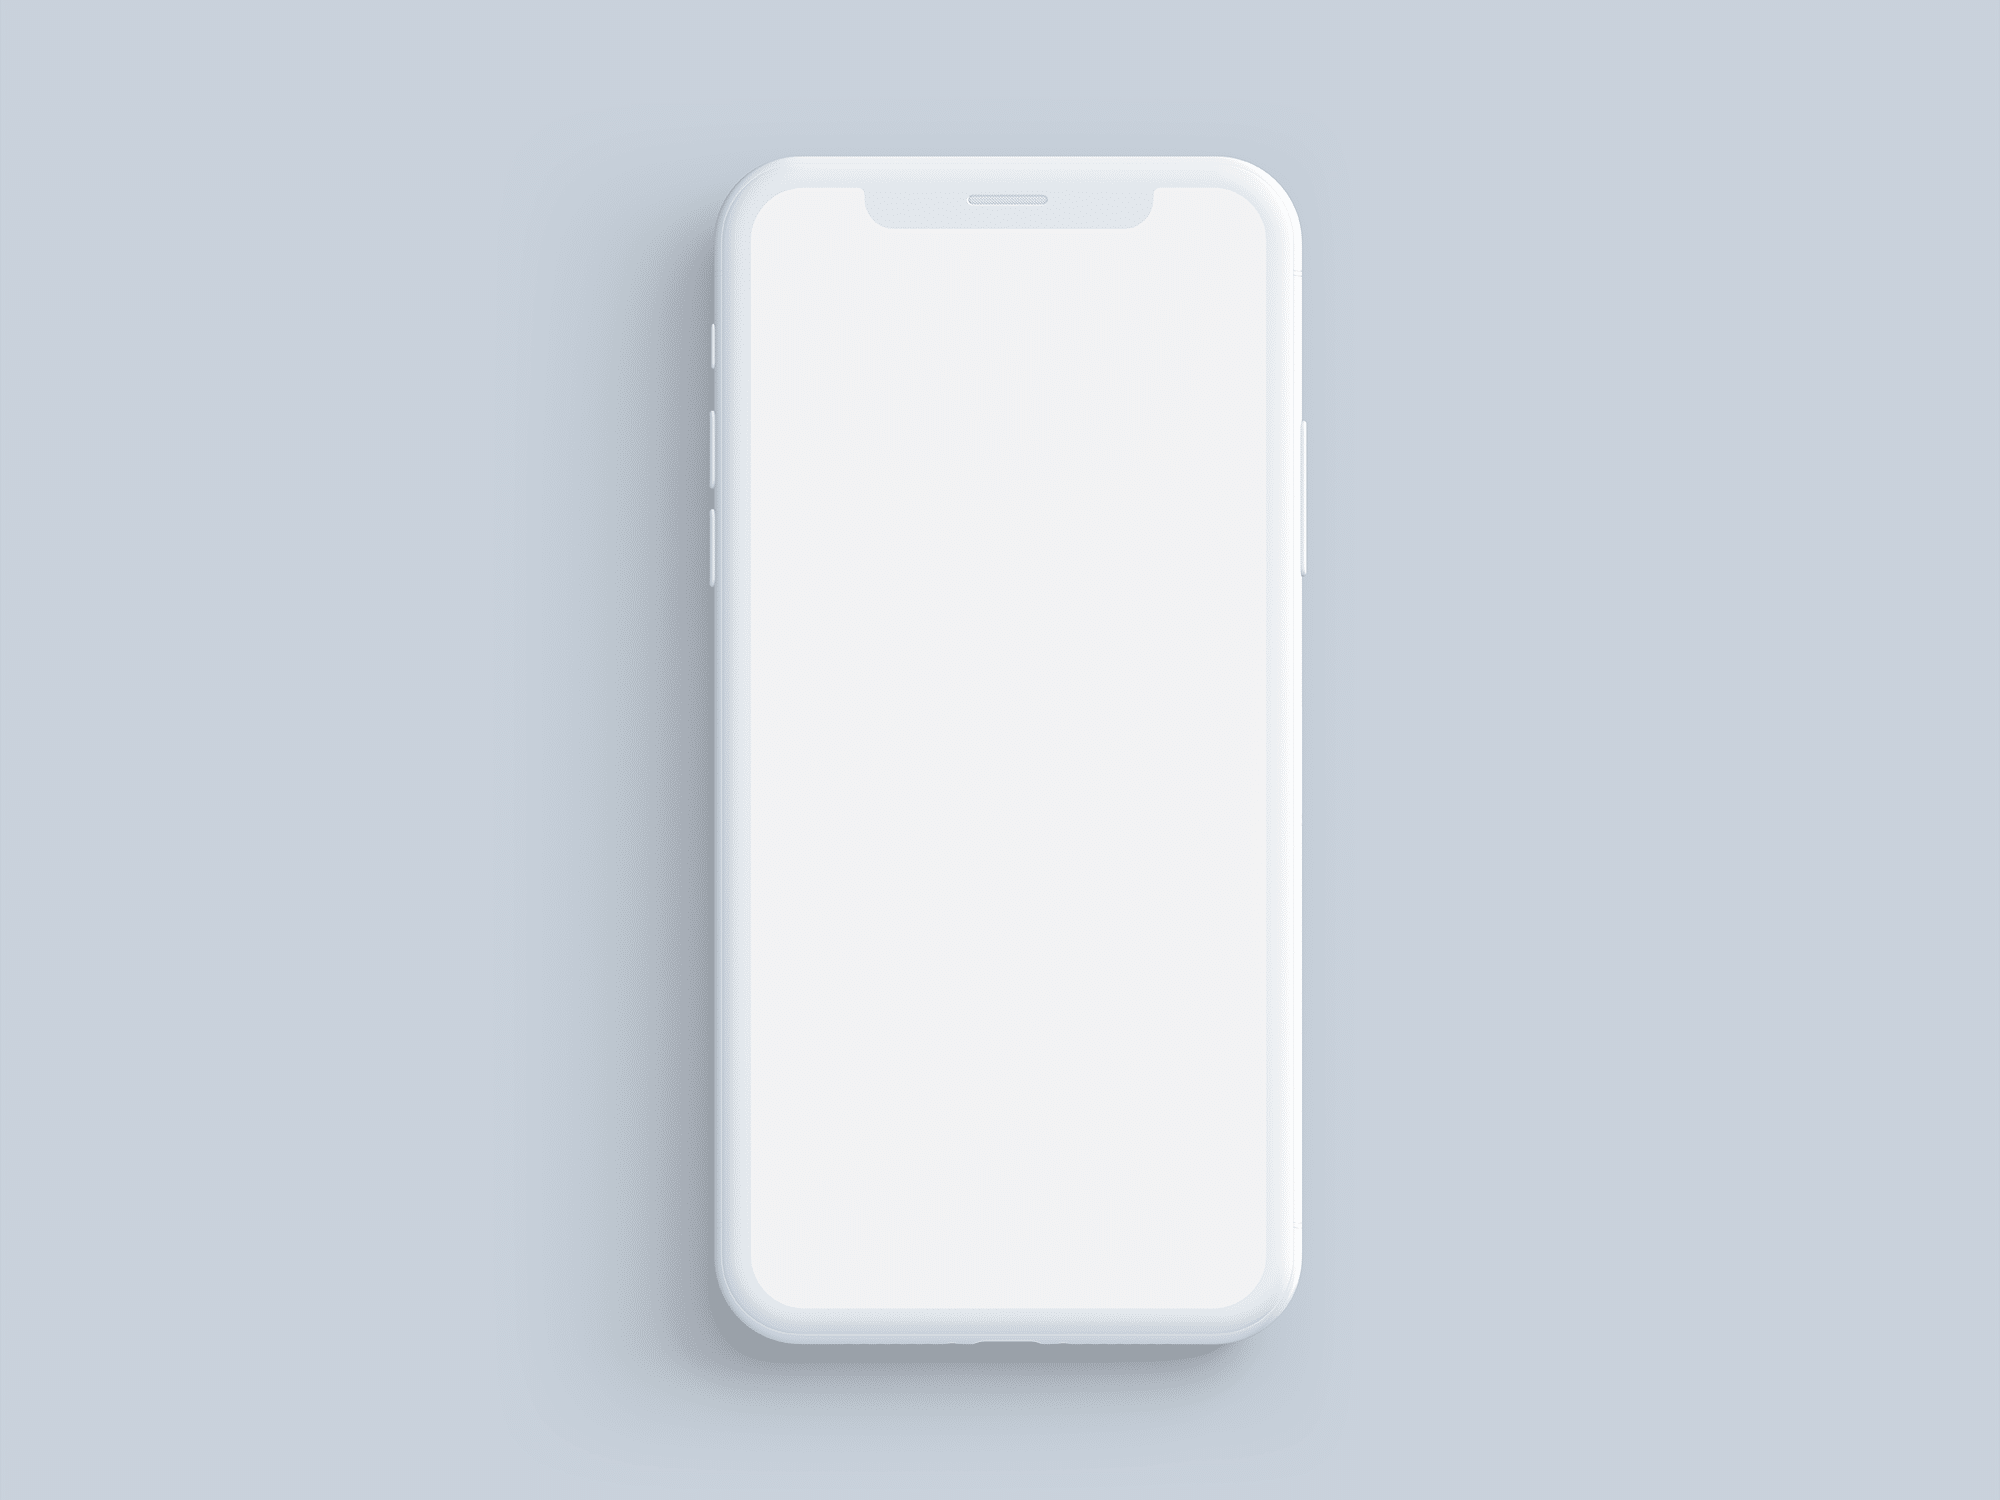 Simple Customizable Iphone X Mockups The Mockup Club Iphone Mockup Free Iphone Mockup Imac